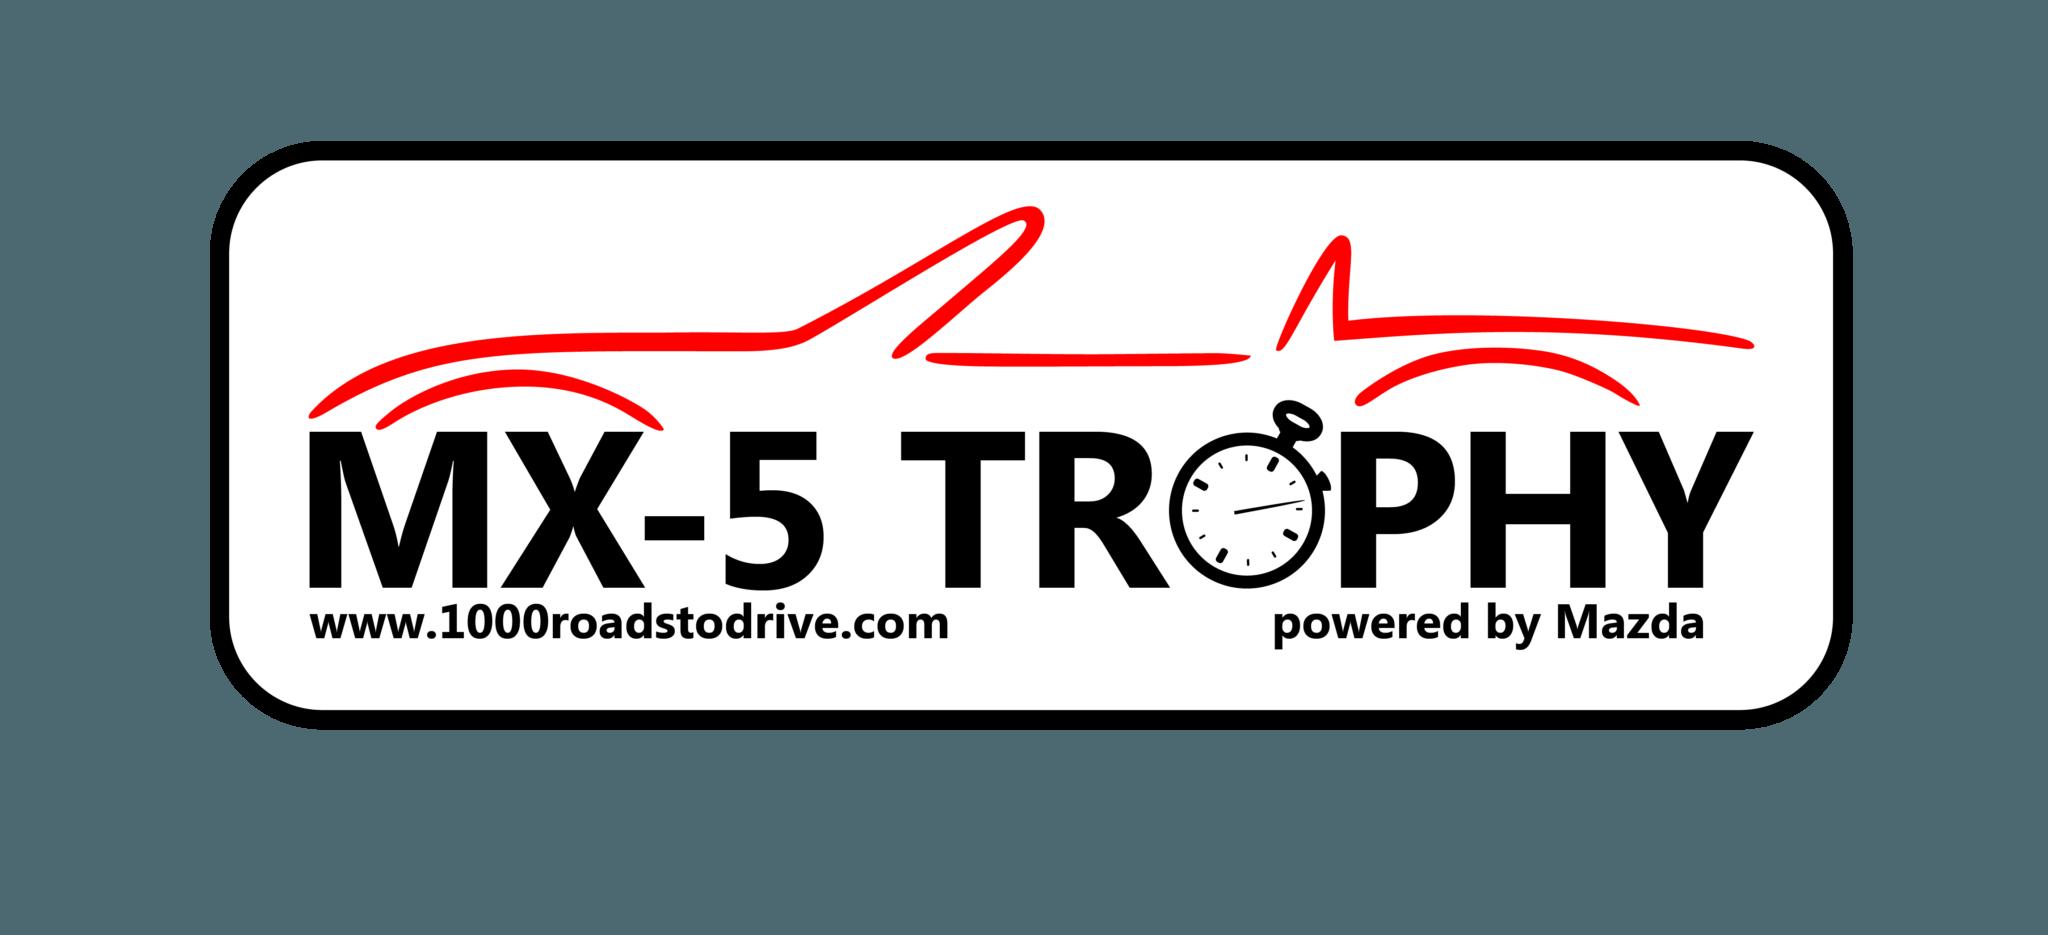 MX-5 Trophy powered by Mazda